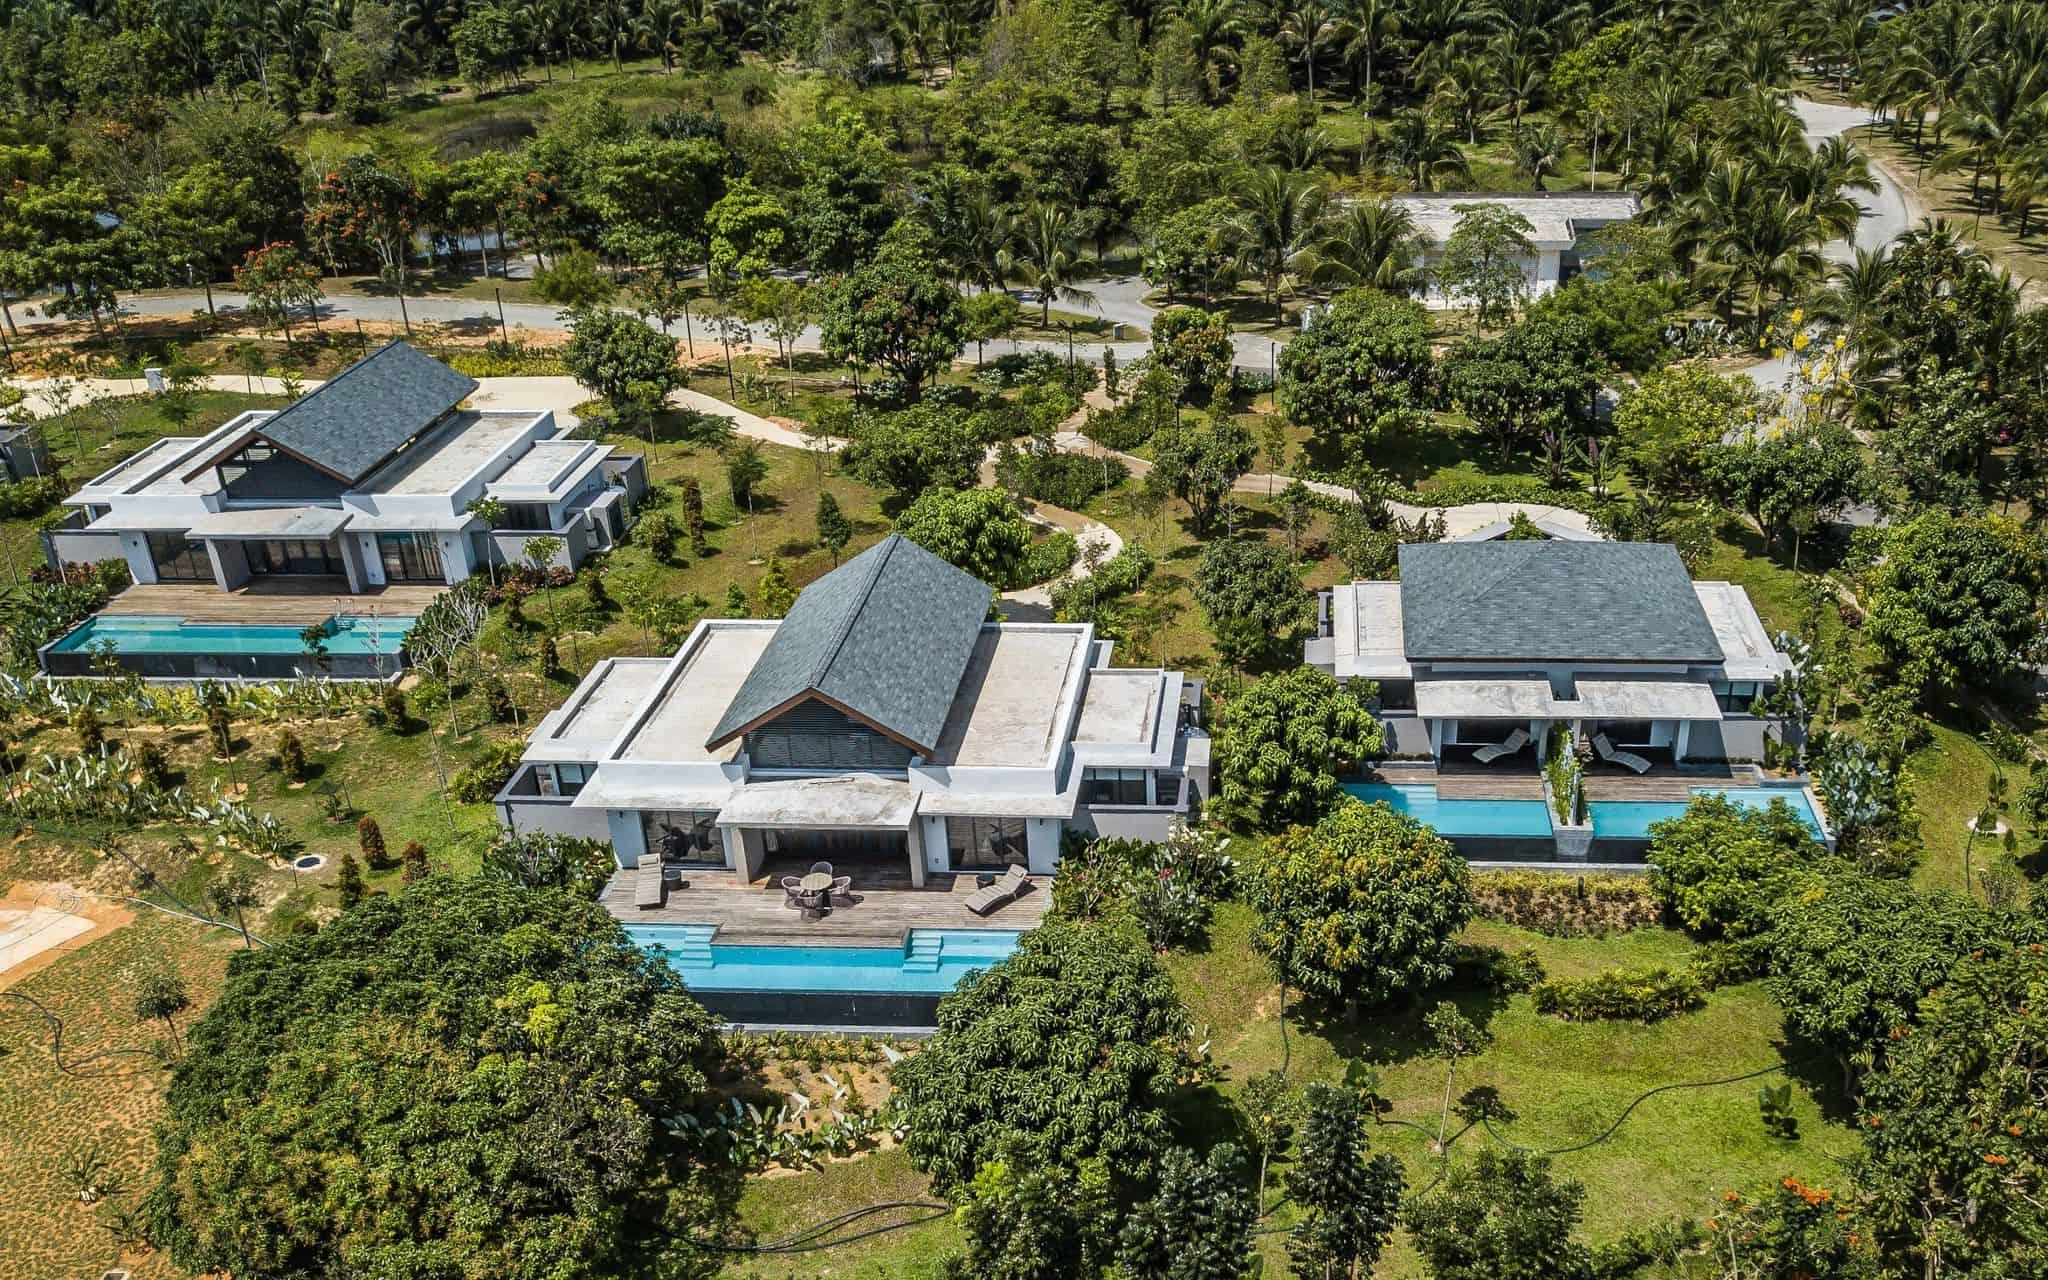 mangala-Resort-and-spa-gambang-malaysia-Travel-Mermaid